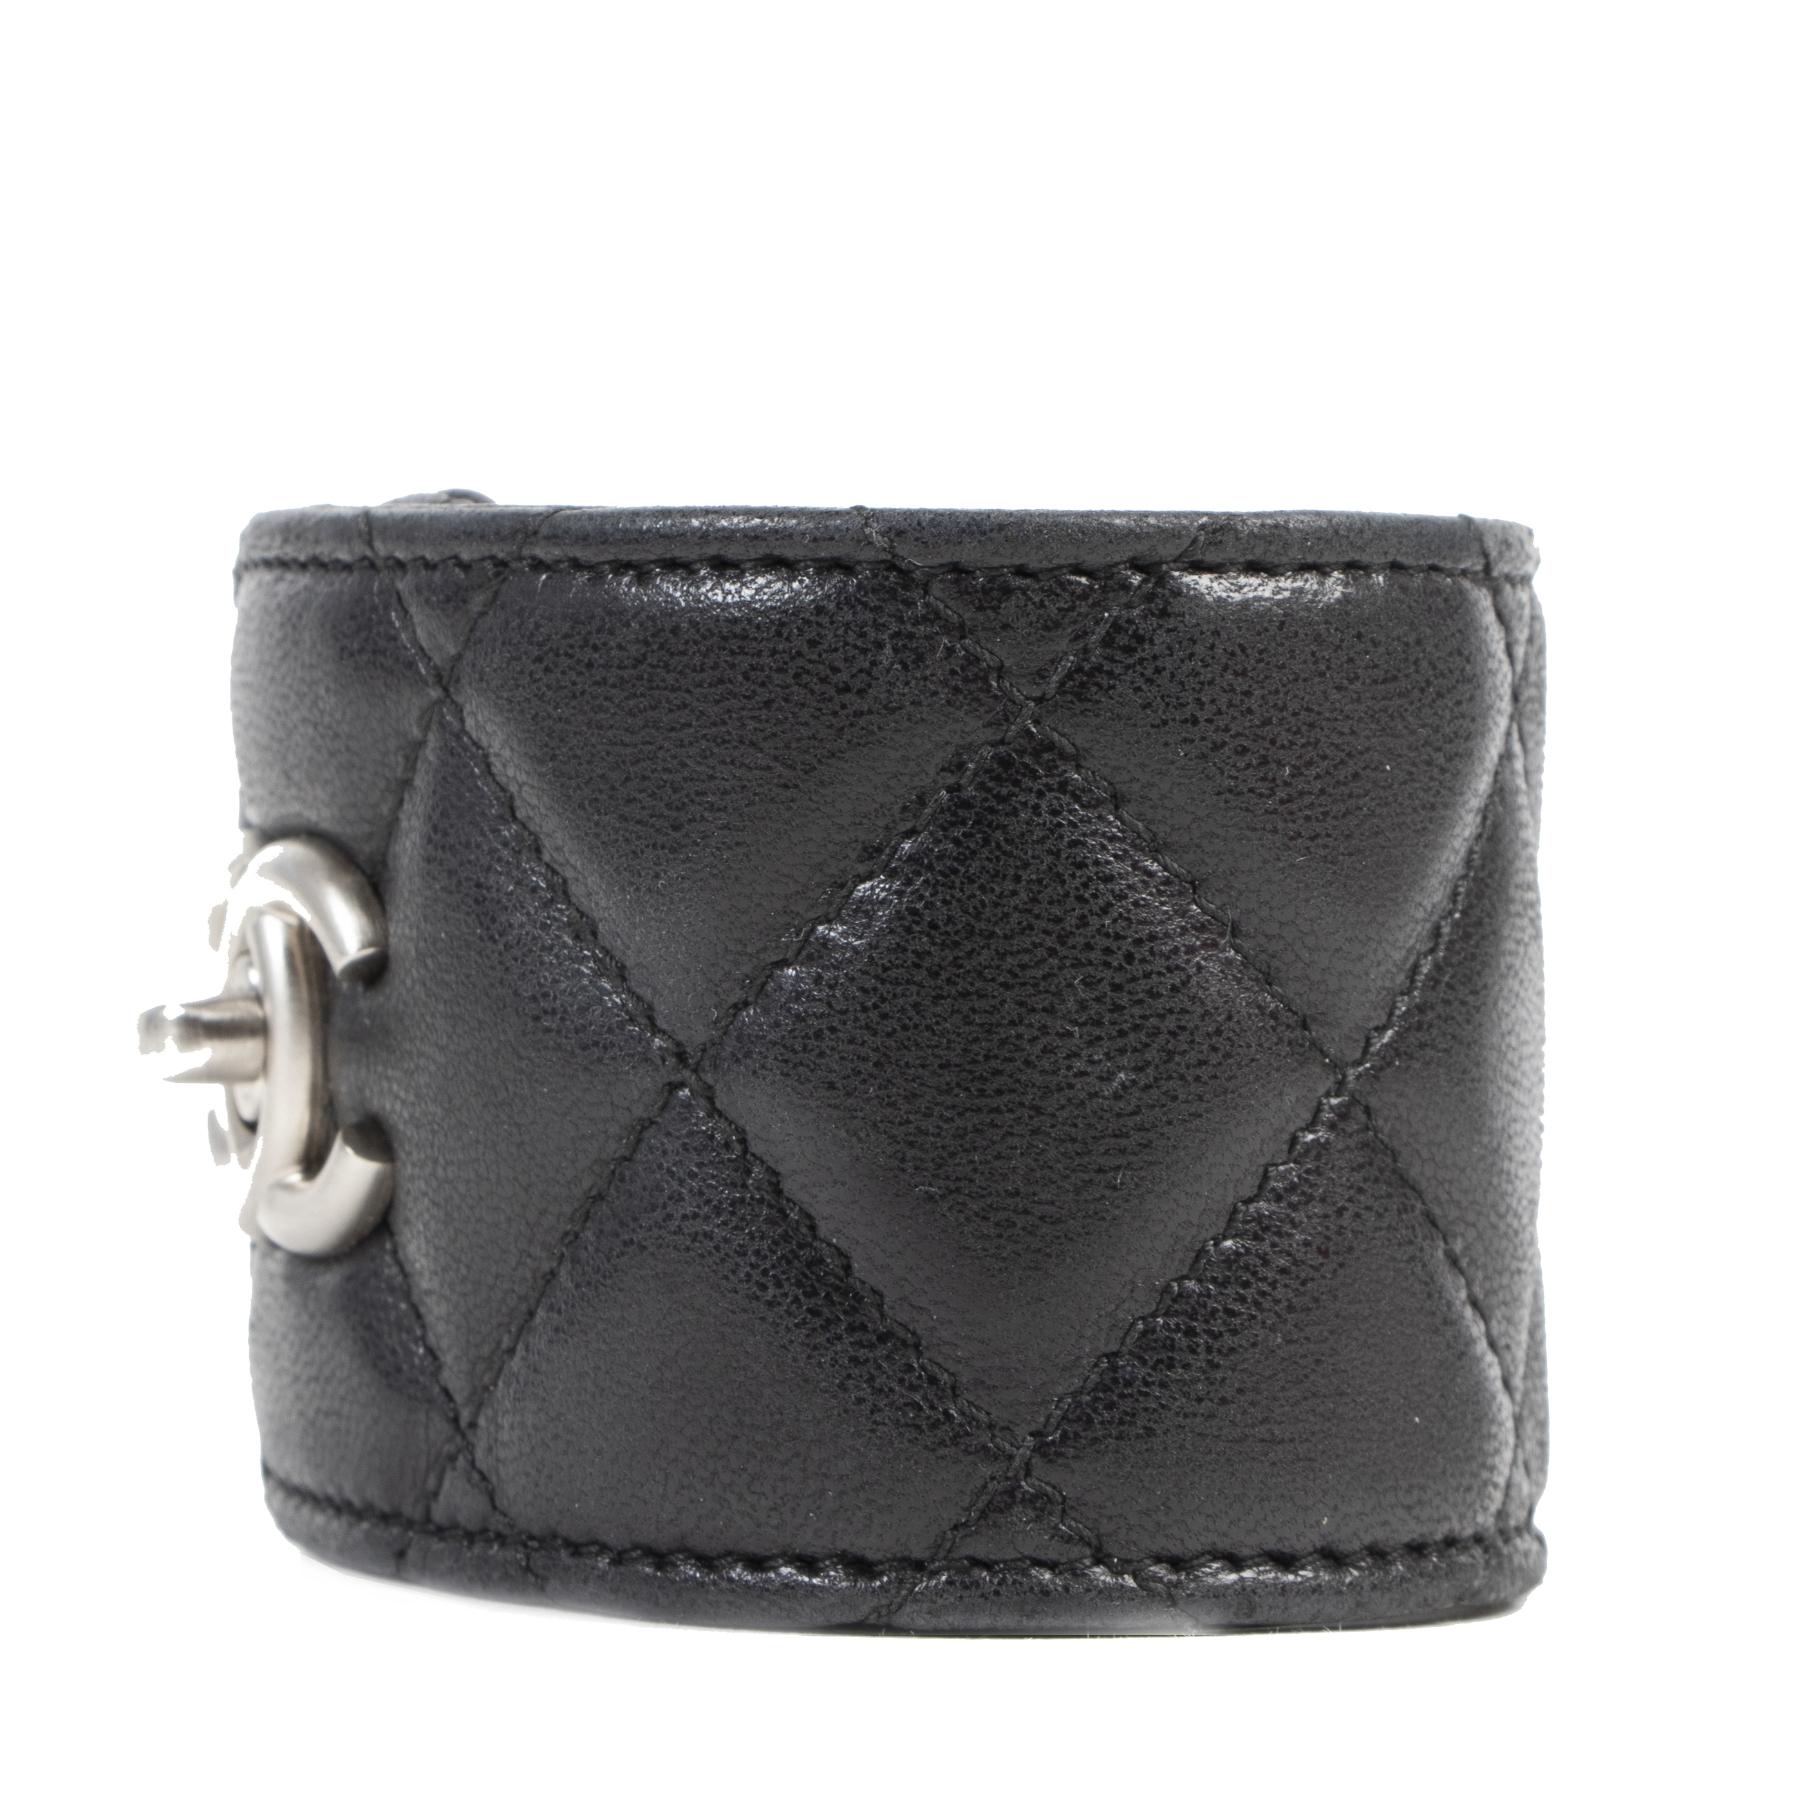 Authentic secondhand Chanel Black Leather CC Turnlock Bracelet designer accessories fashion luxury vintage webshop safe secure online shopping